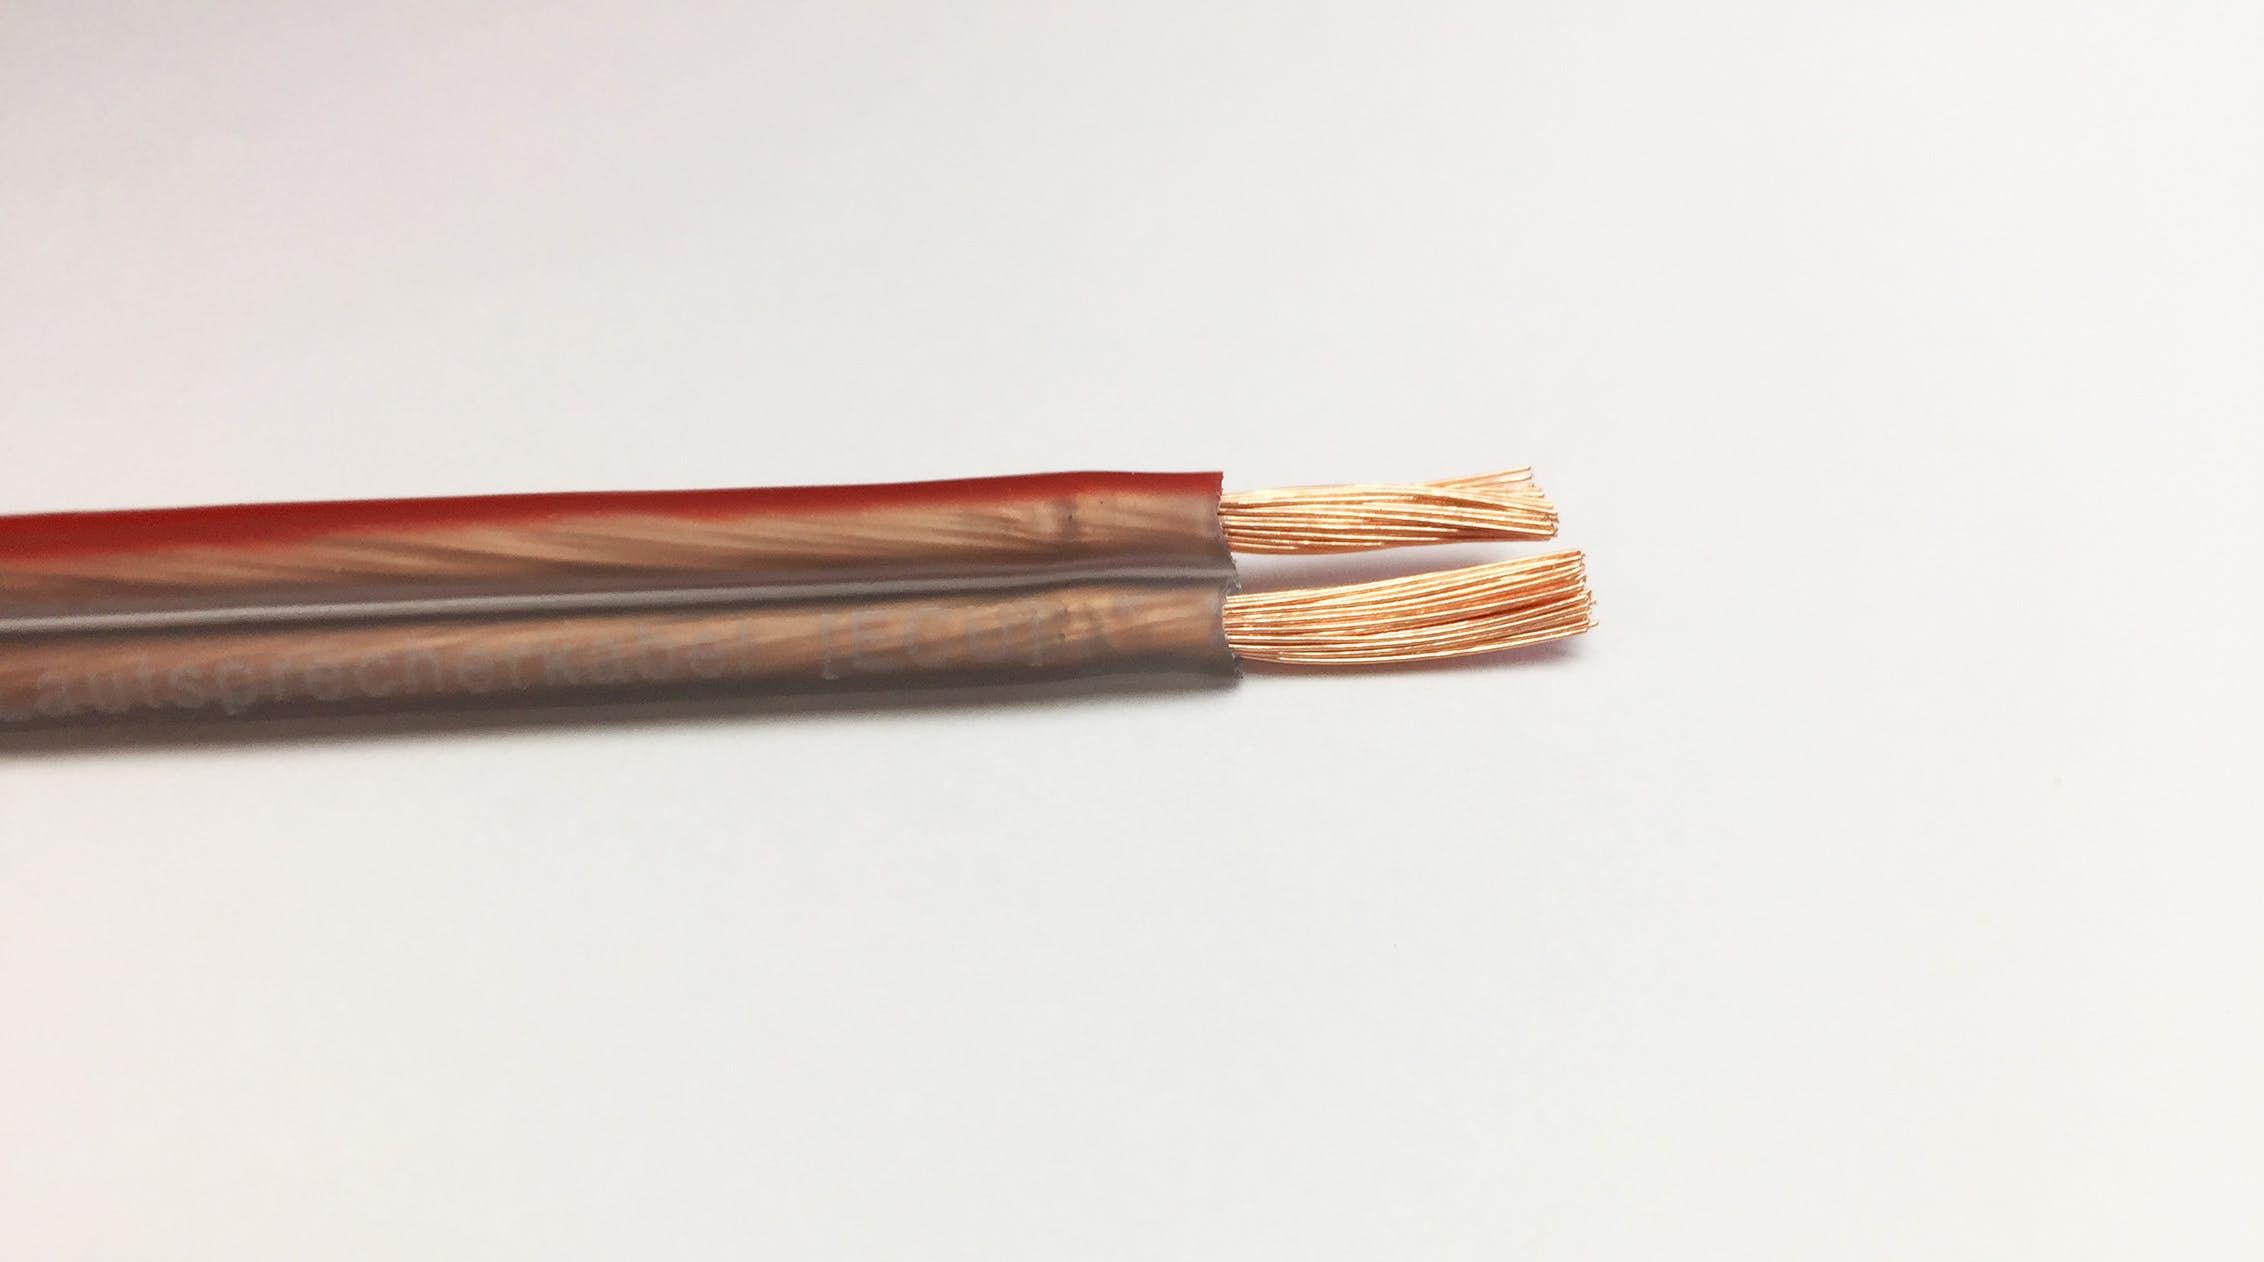 Zvočniški kabel 2 x 1,5 mm - High Quality OFC Copper